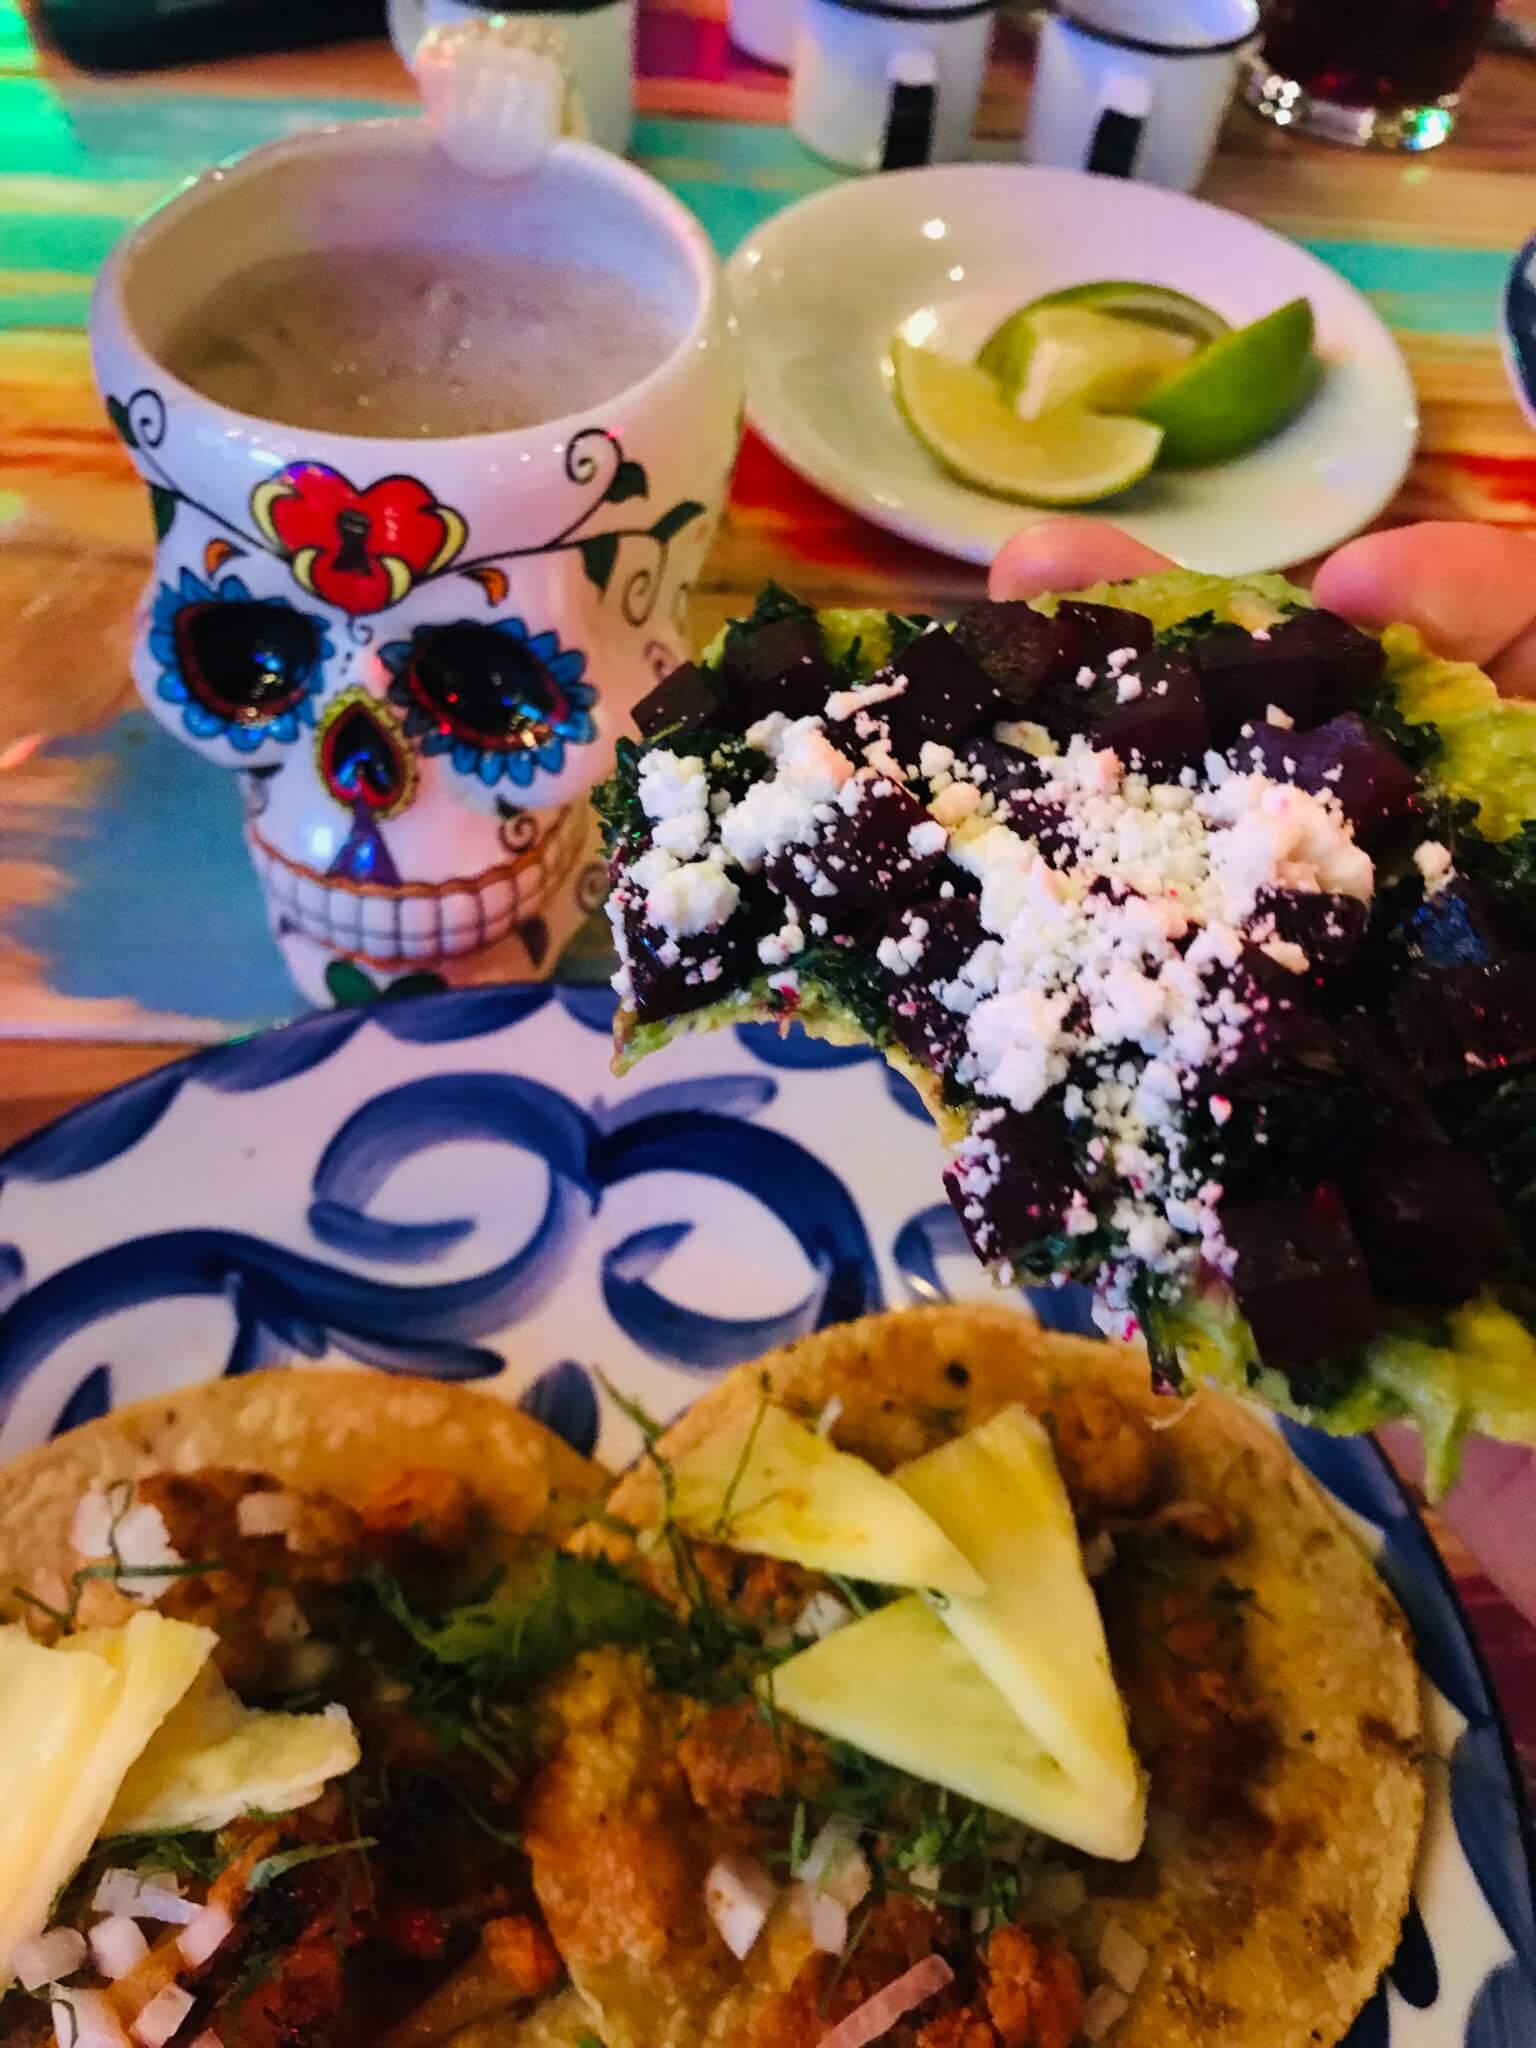 Vegan tacos and vegetarian tostada | Vegan restaurants in Mexico City